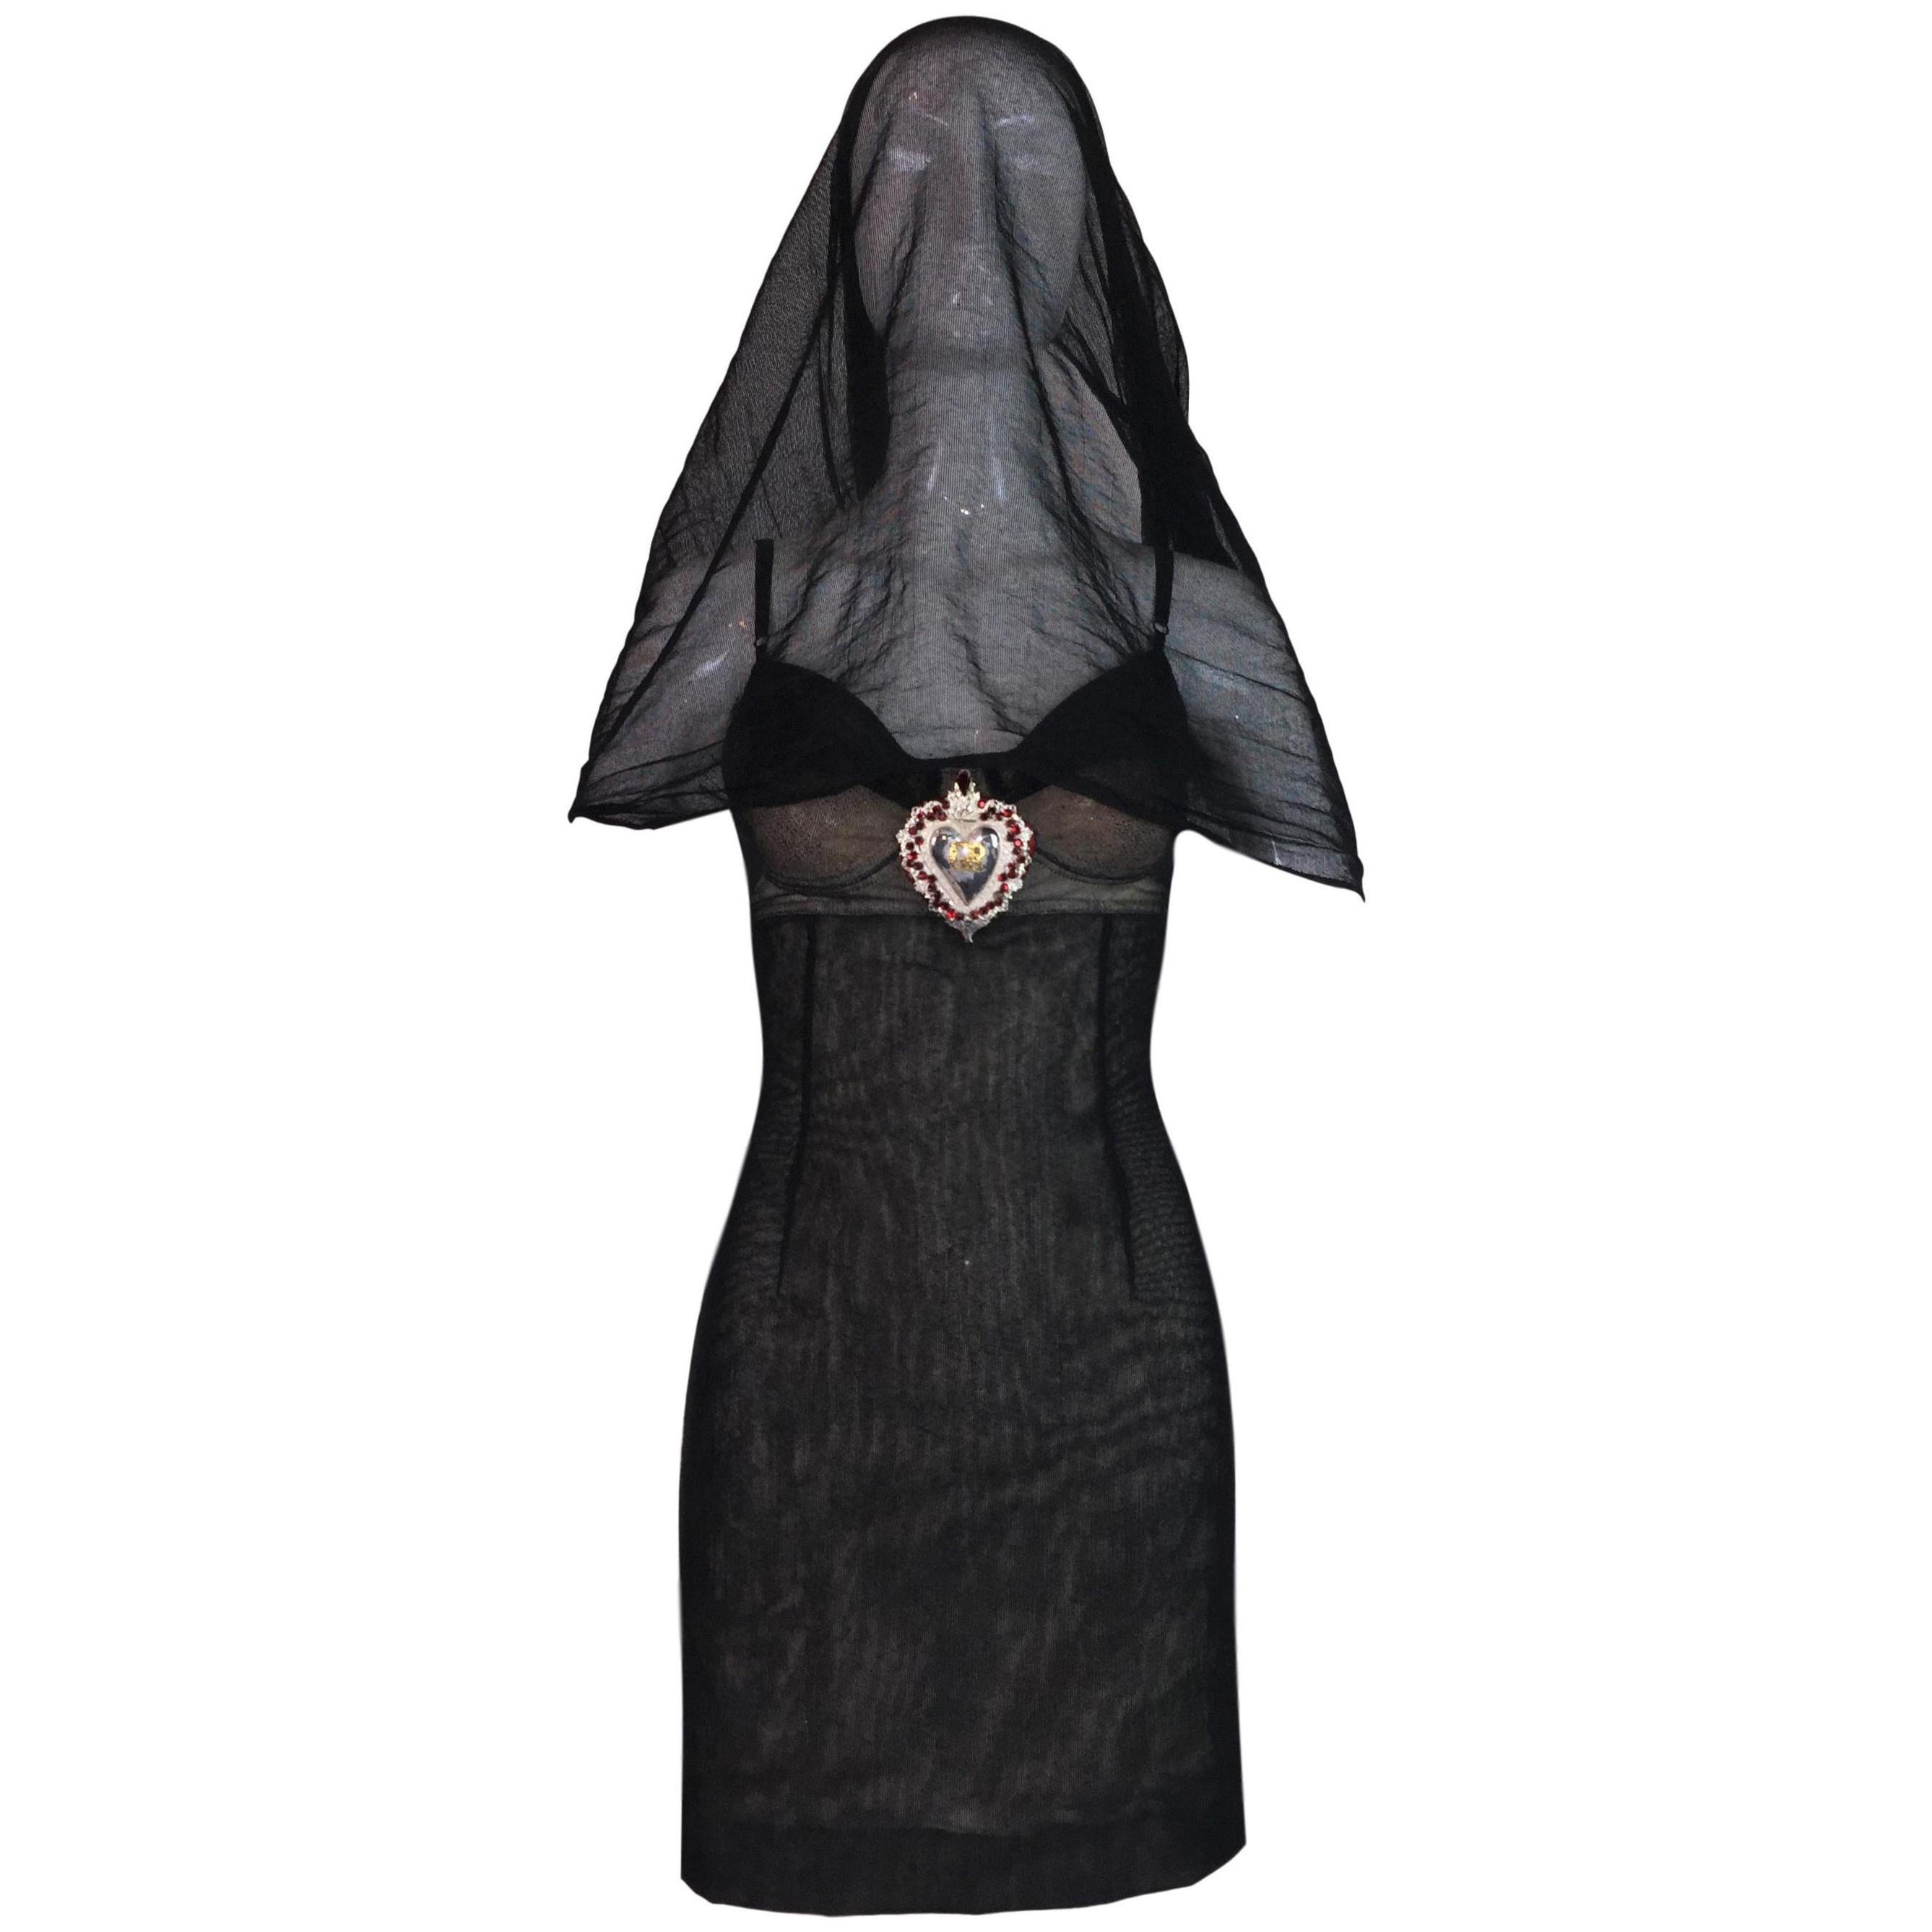 S/S 1998 Dolce & Gabbana Runway Ad Sheer Mesh Madonna Veil Charm Mini Dress